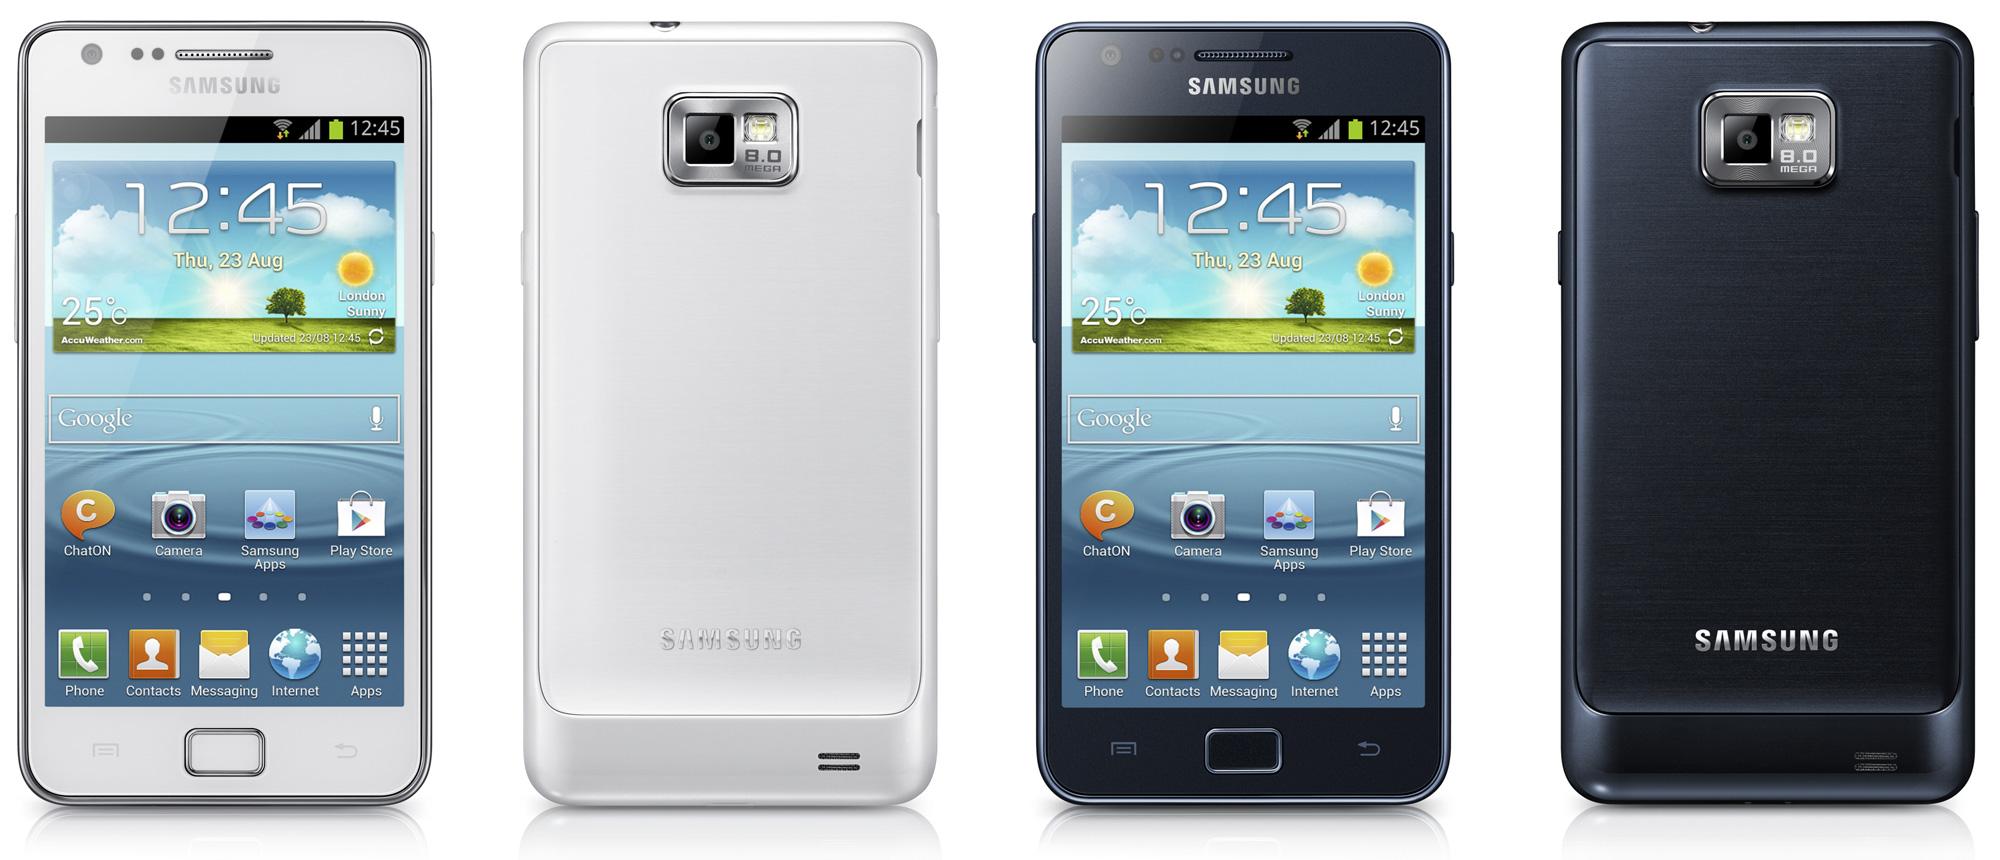 Samsung Galaxy S2 Plus jetzt ab 325 Euro vorbestellbar – Lieferung Ende Januar, Anfang Februar?